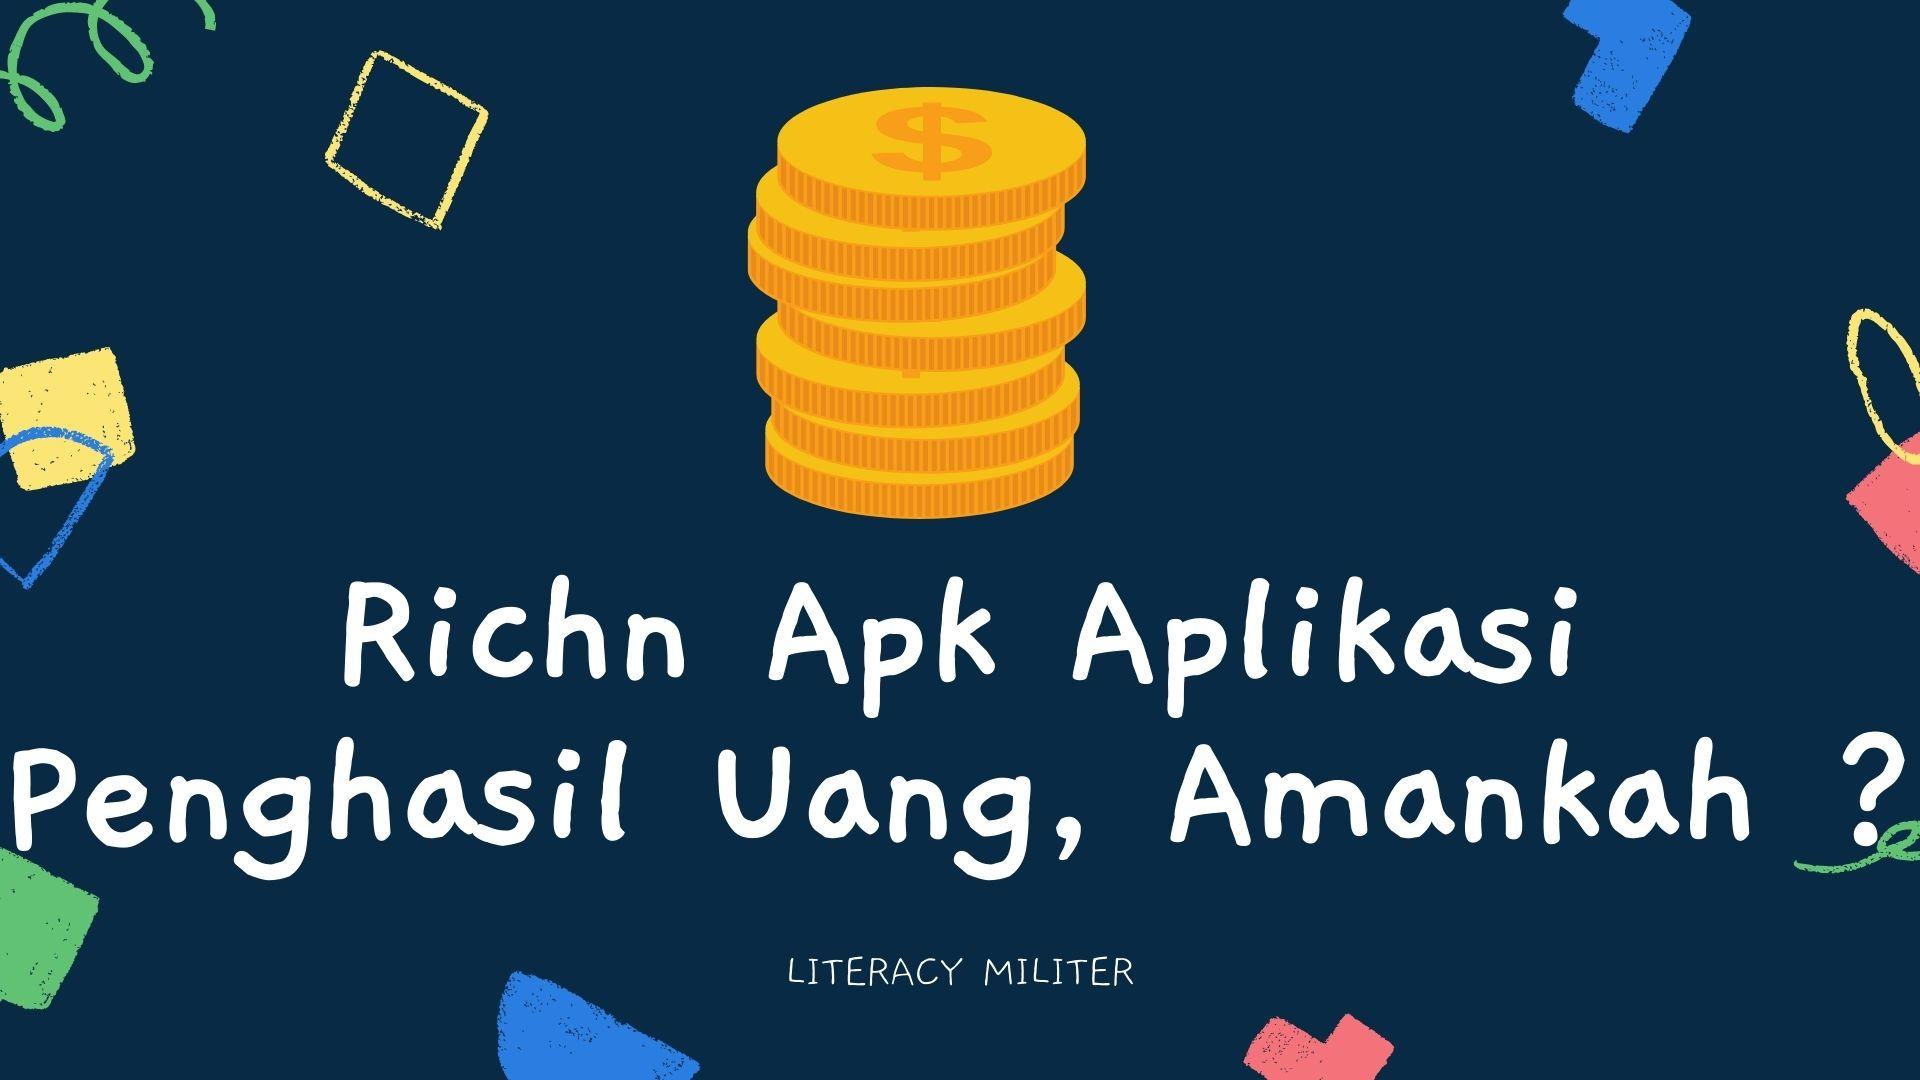 Richn Apk Aplikasi Penghasil Uang Amankah Literacy Militer